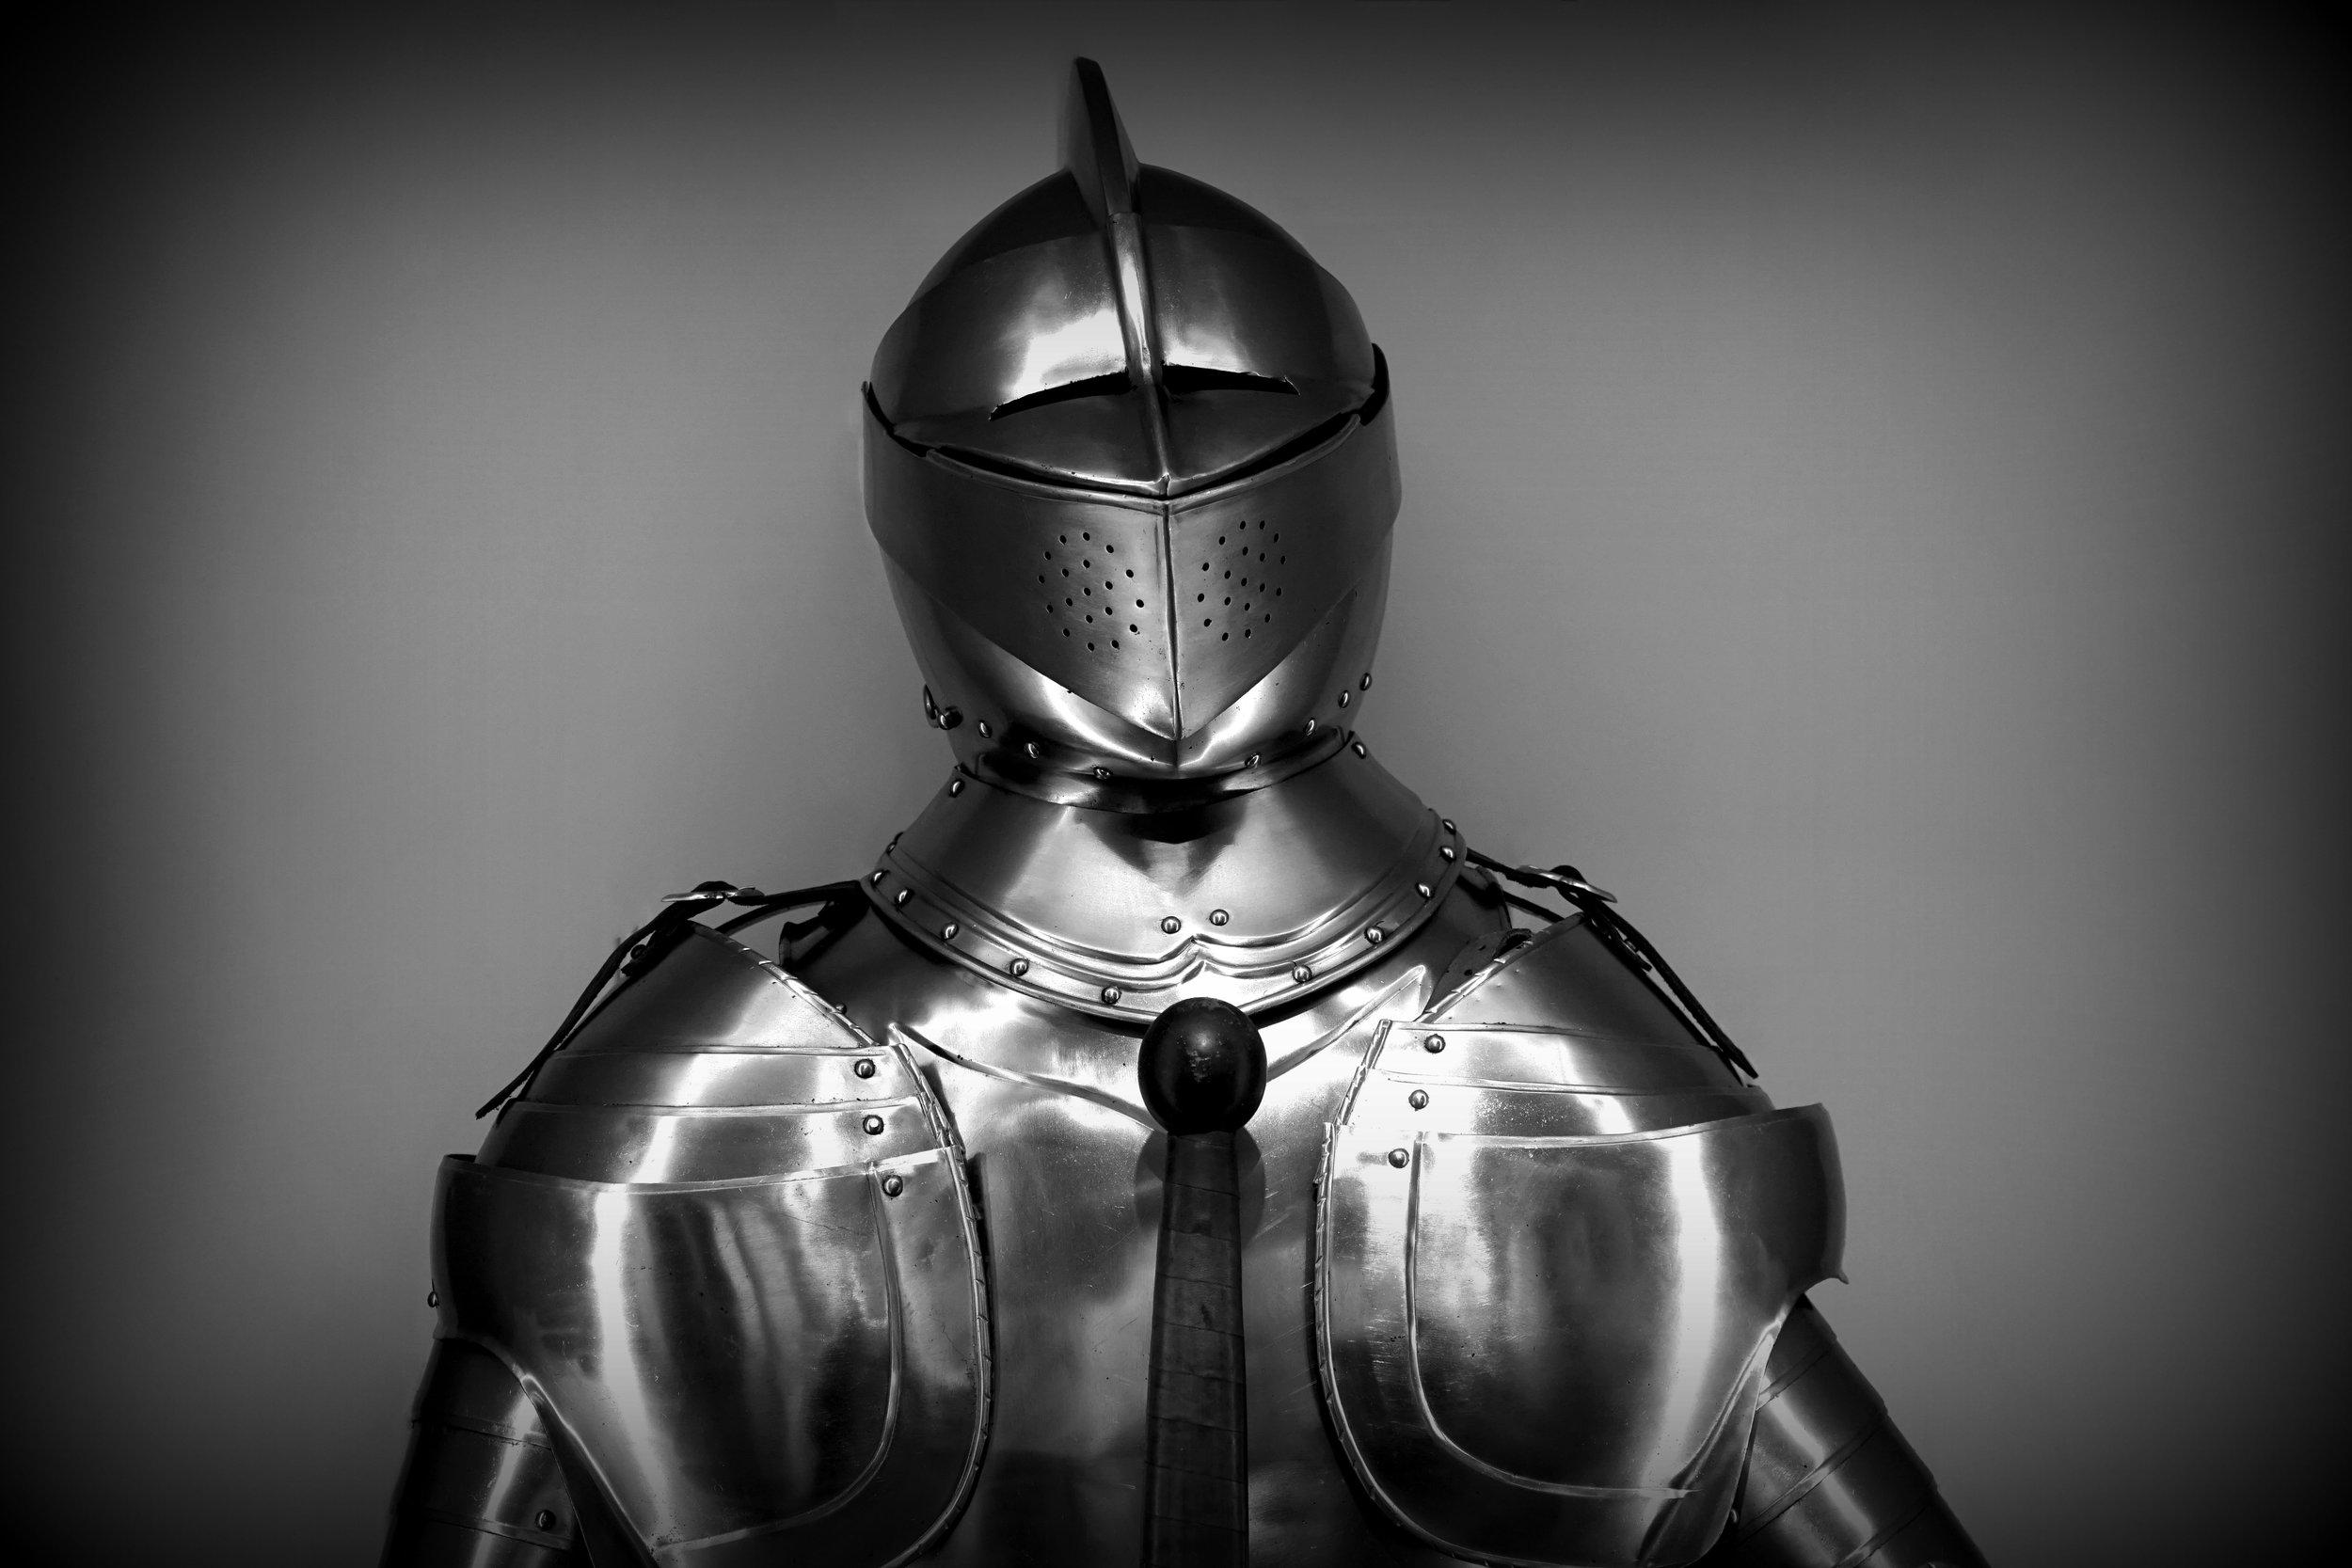 antique-armor-black-and-white-350784.jpg